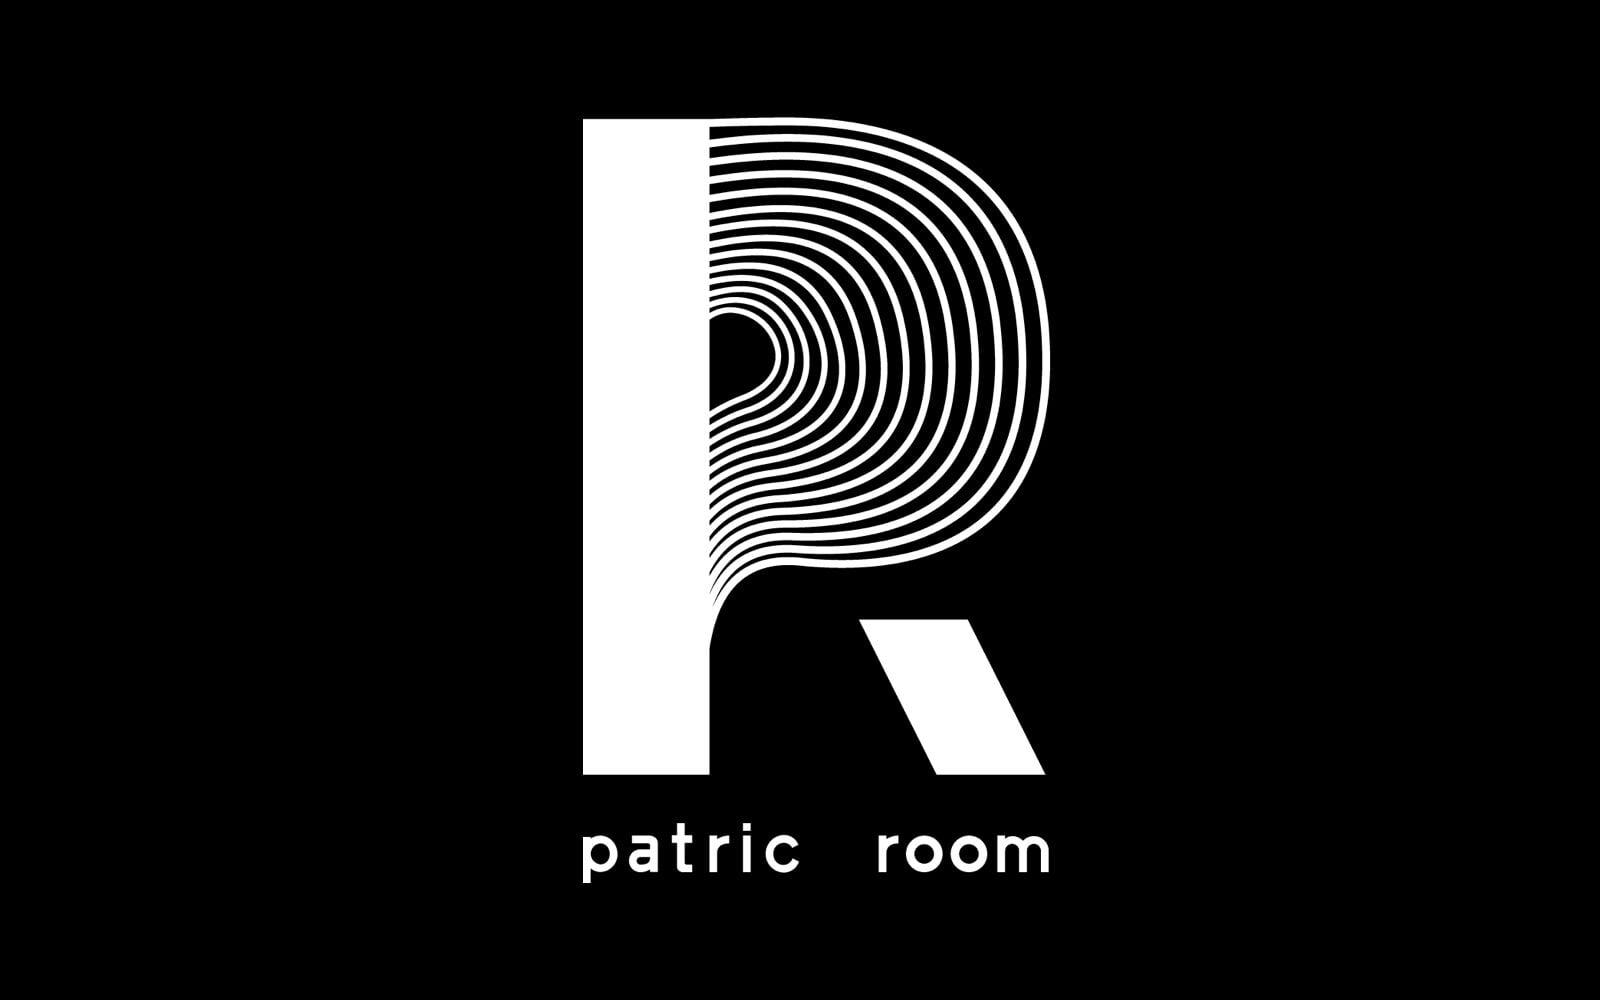 Patric Room